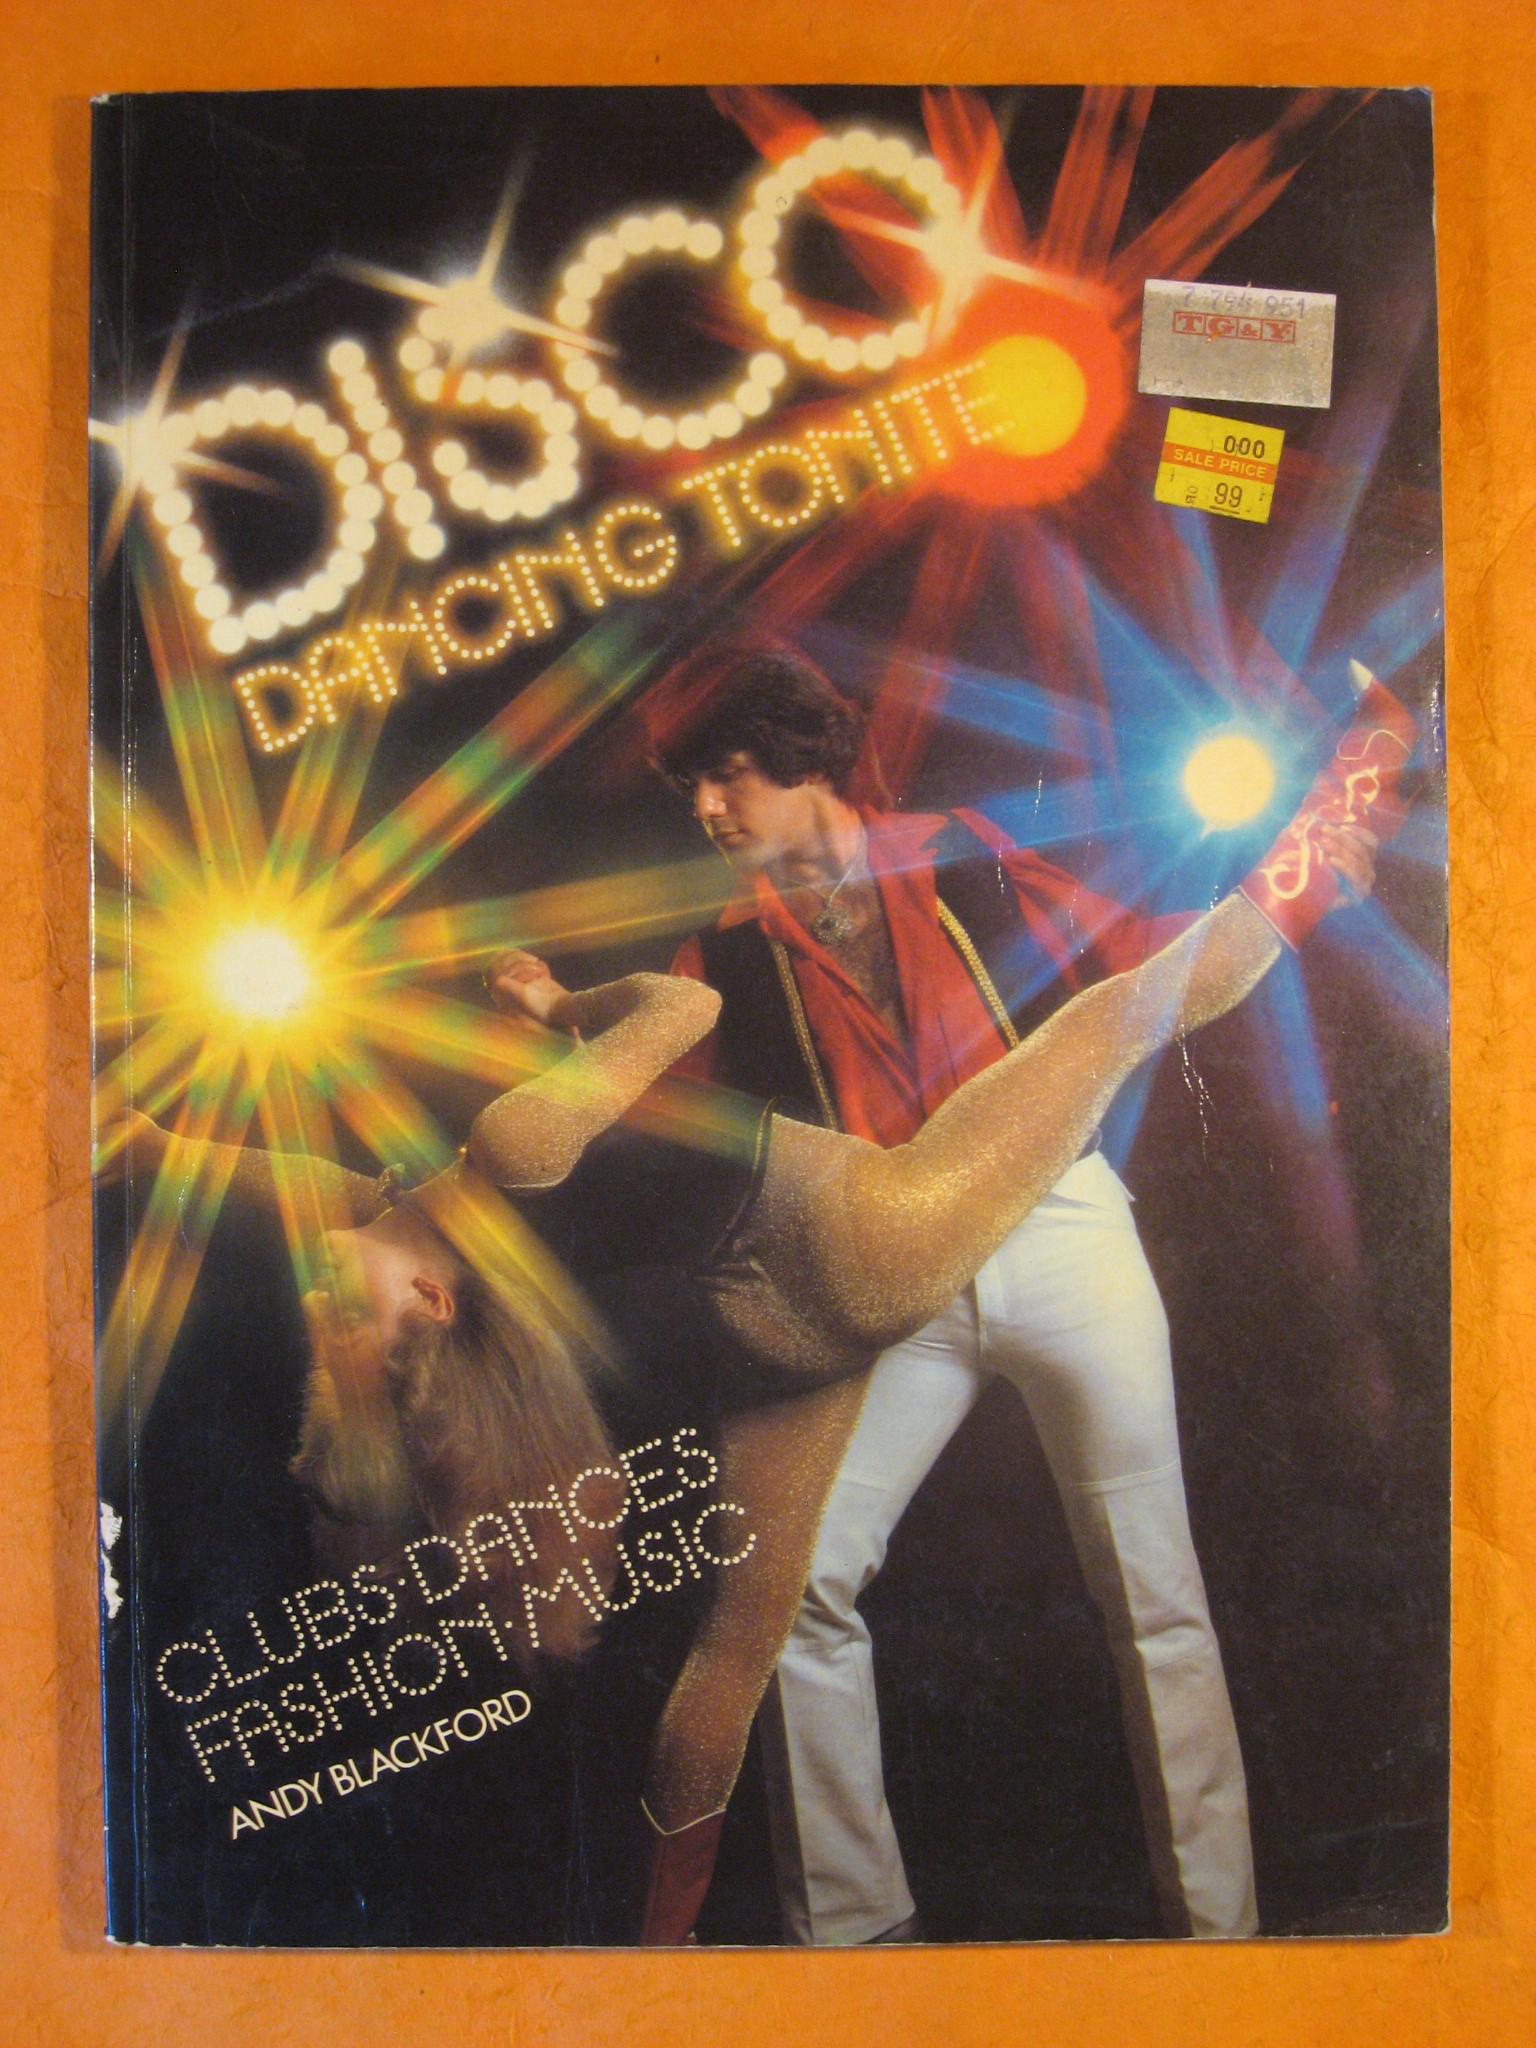 Disco Dancing Tonite:  Clubs, Dances, Fashion, Music, Blackford, Andy